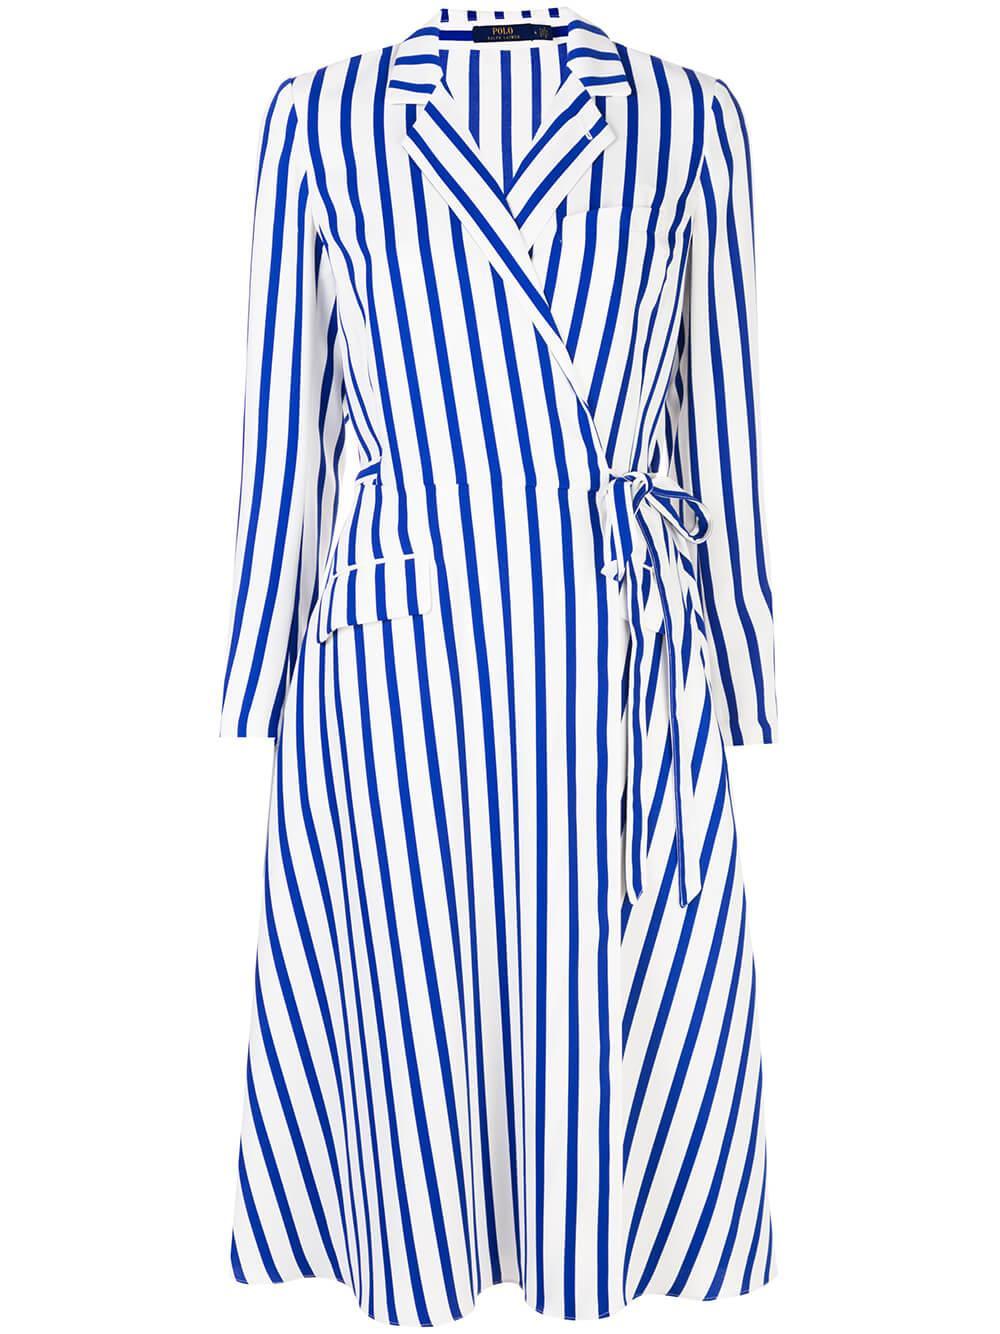 L/S Striped Wrap Dress With Collar Item # 211781152001